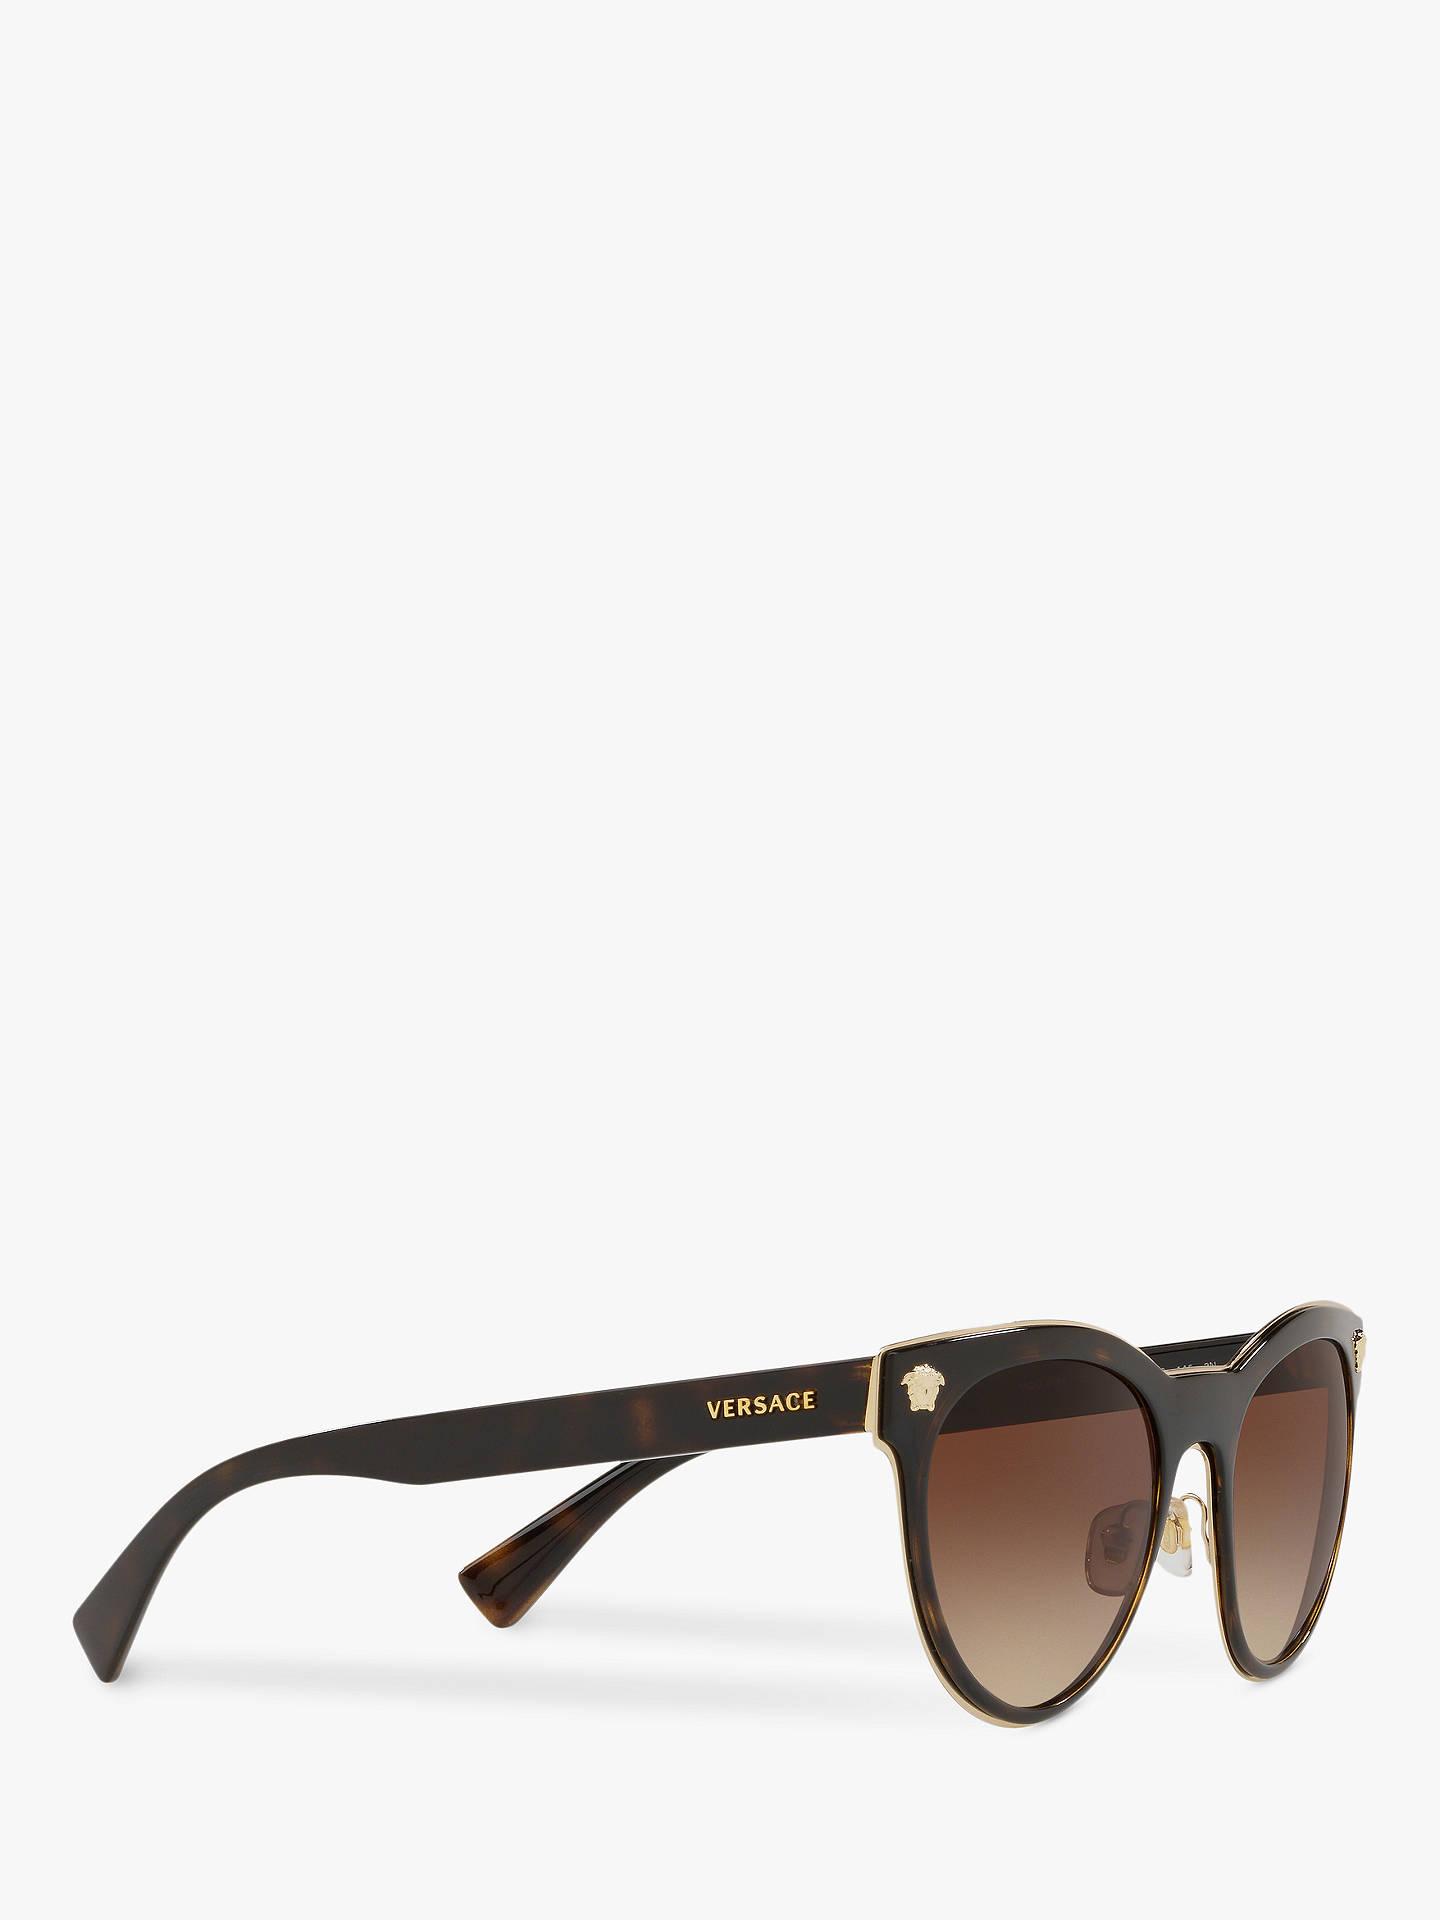 fe45326bb2 ... Buy Versace VE2198 Women s Oval Sunglasses